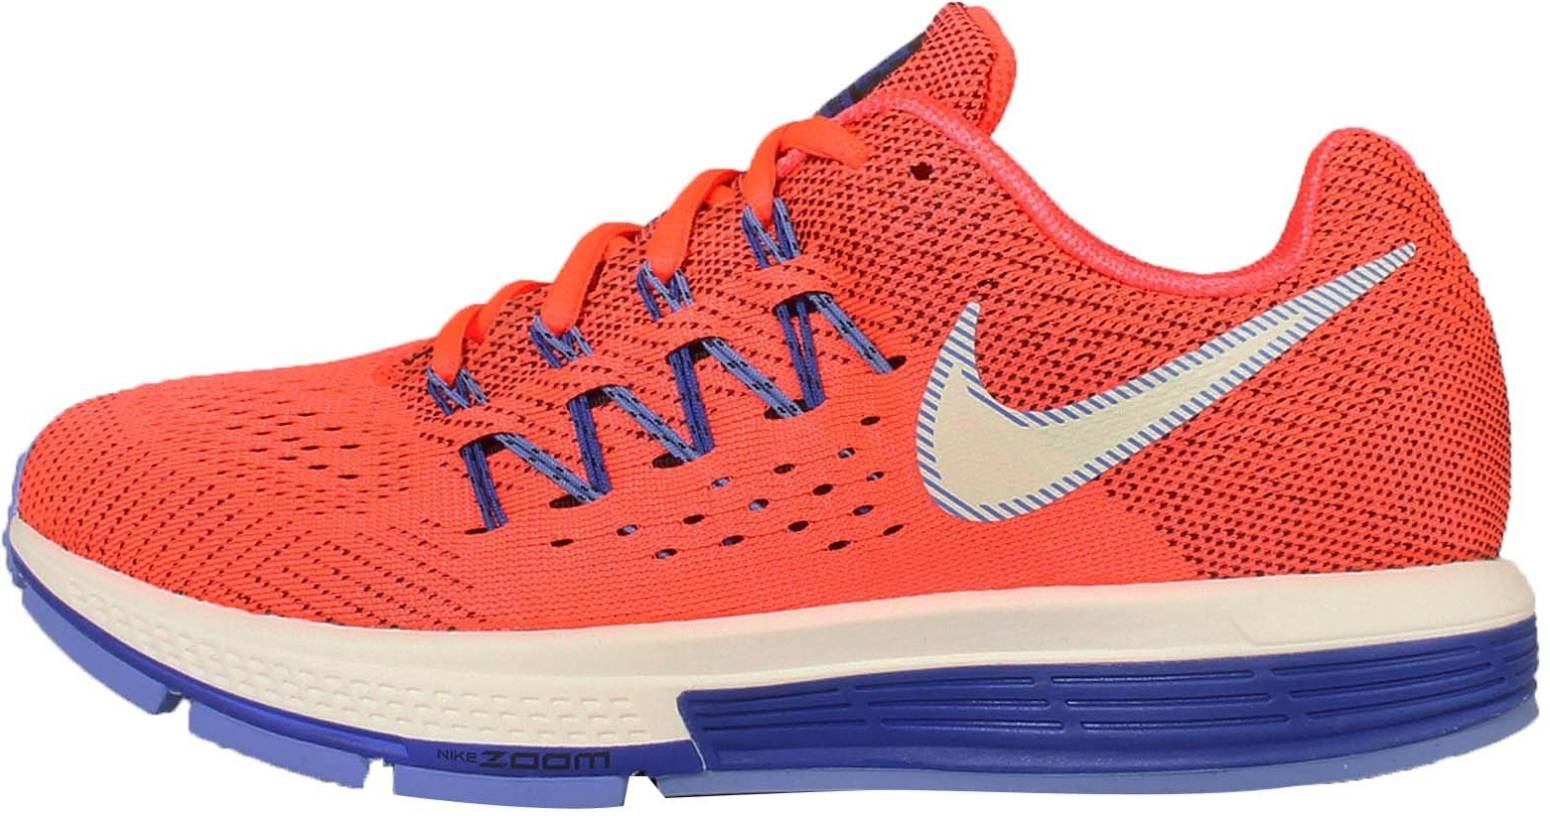 Presunto Haiku Impuro  Nike Air Zoom Vomero 10 - Deals, Facts, Reviews (2021) | RunRepeat